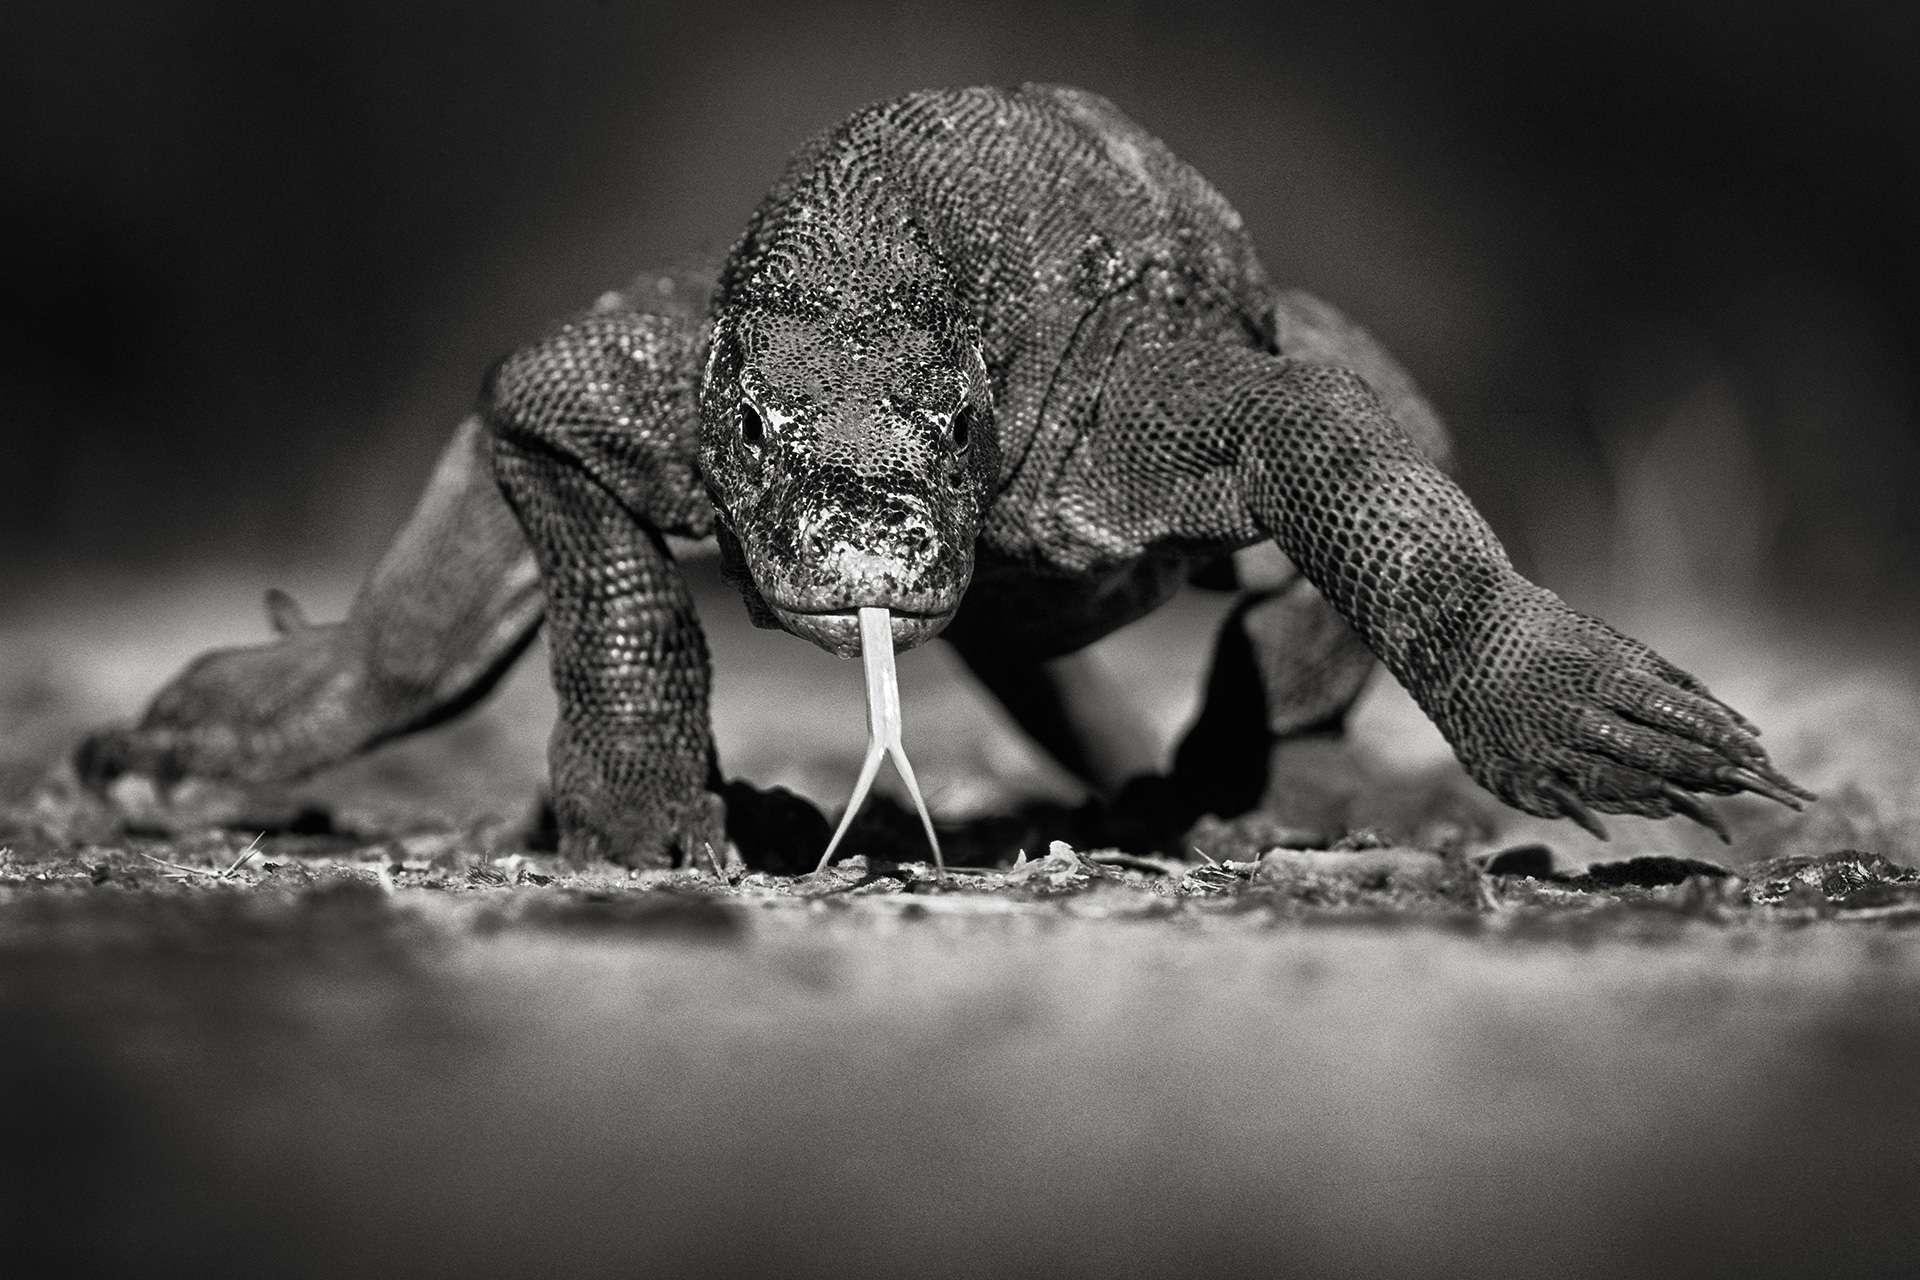 Gilles Martin's photograph : komodo dragon (varanus komodoensis), Struggle for life